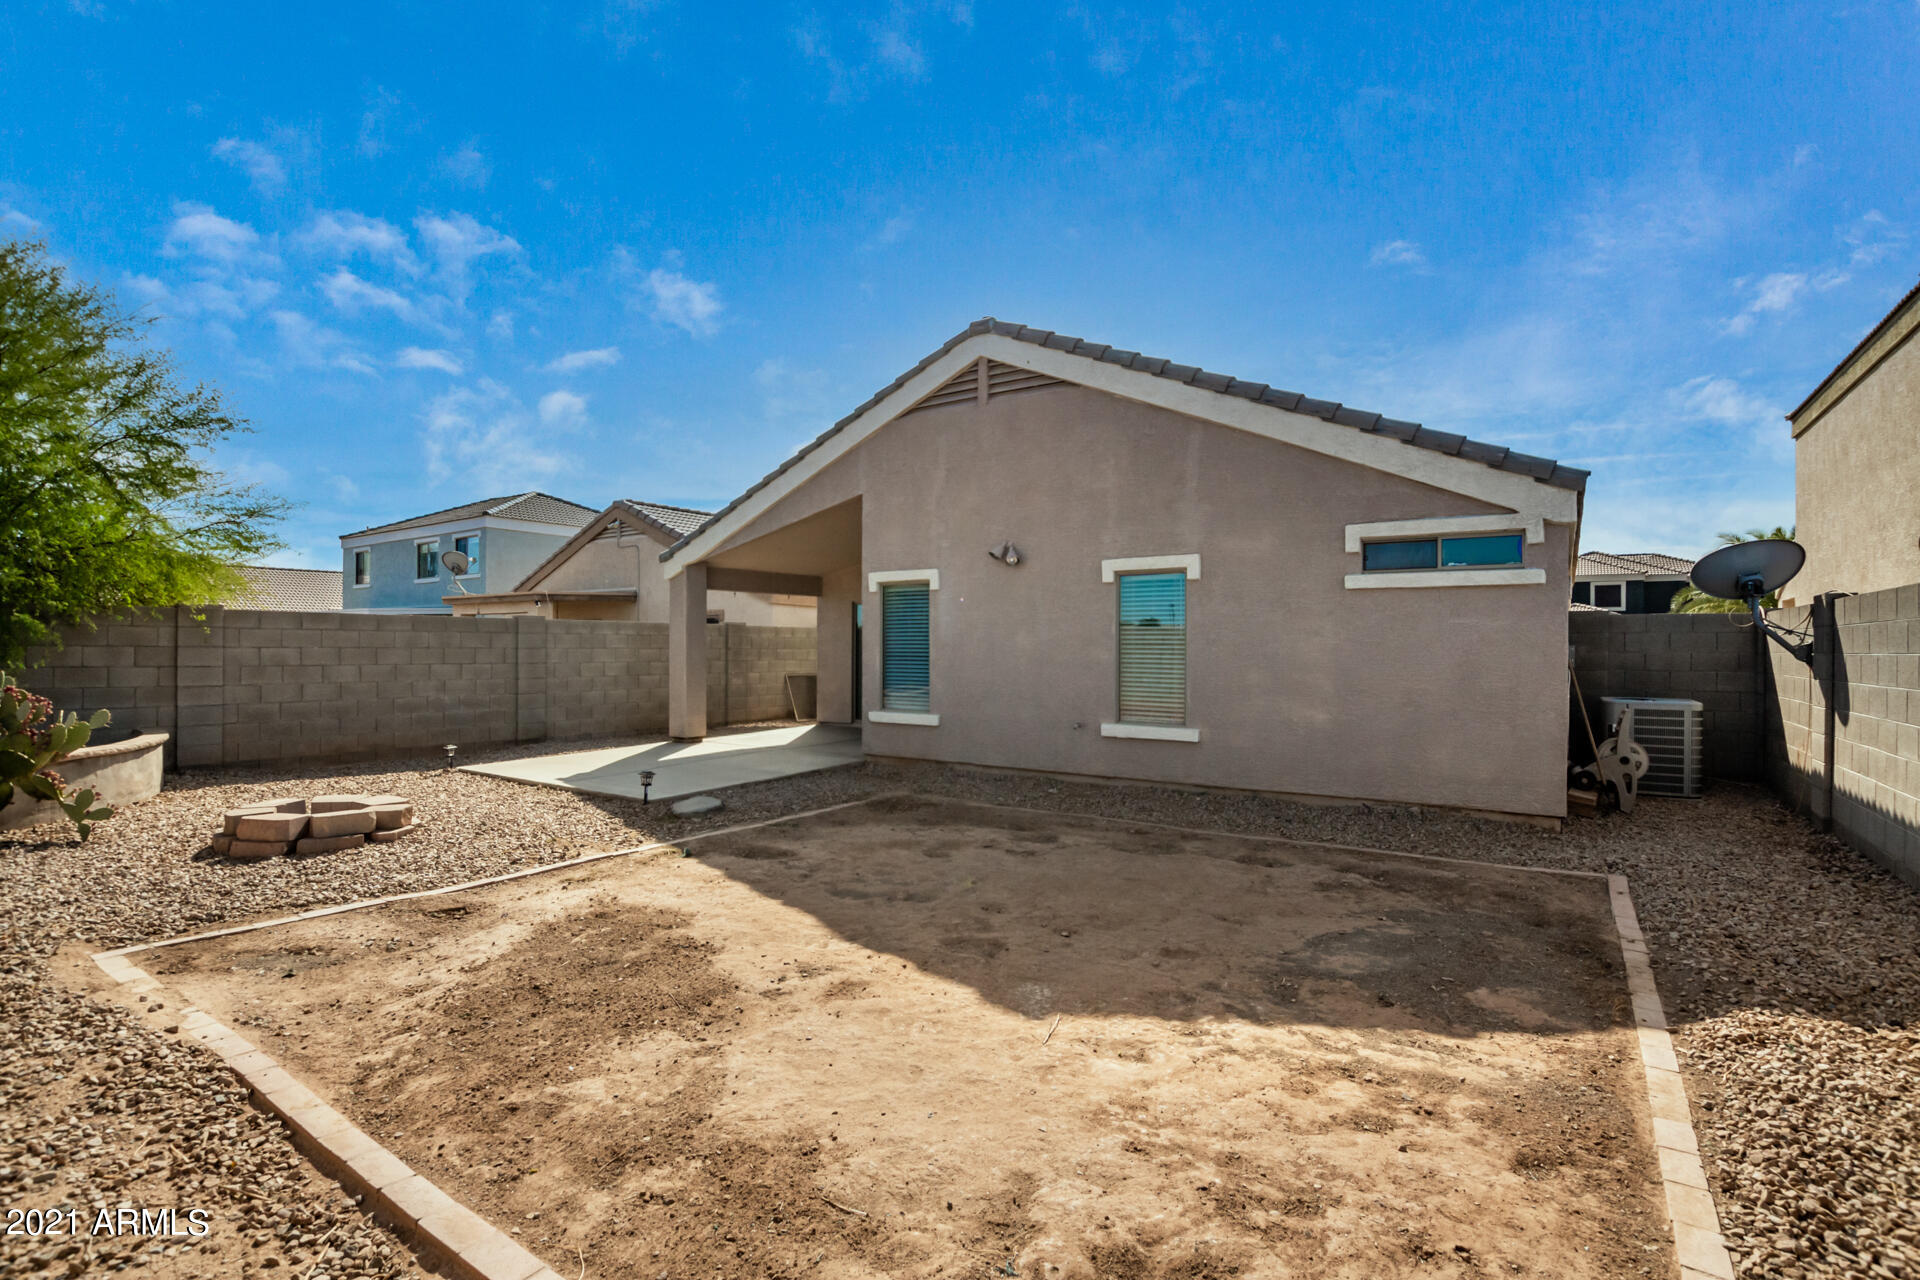 MLS 6311691 12522 W WILLOW Avenue, El Mirage, AZ 85335 El Mirage AZ Buenavida